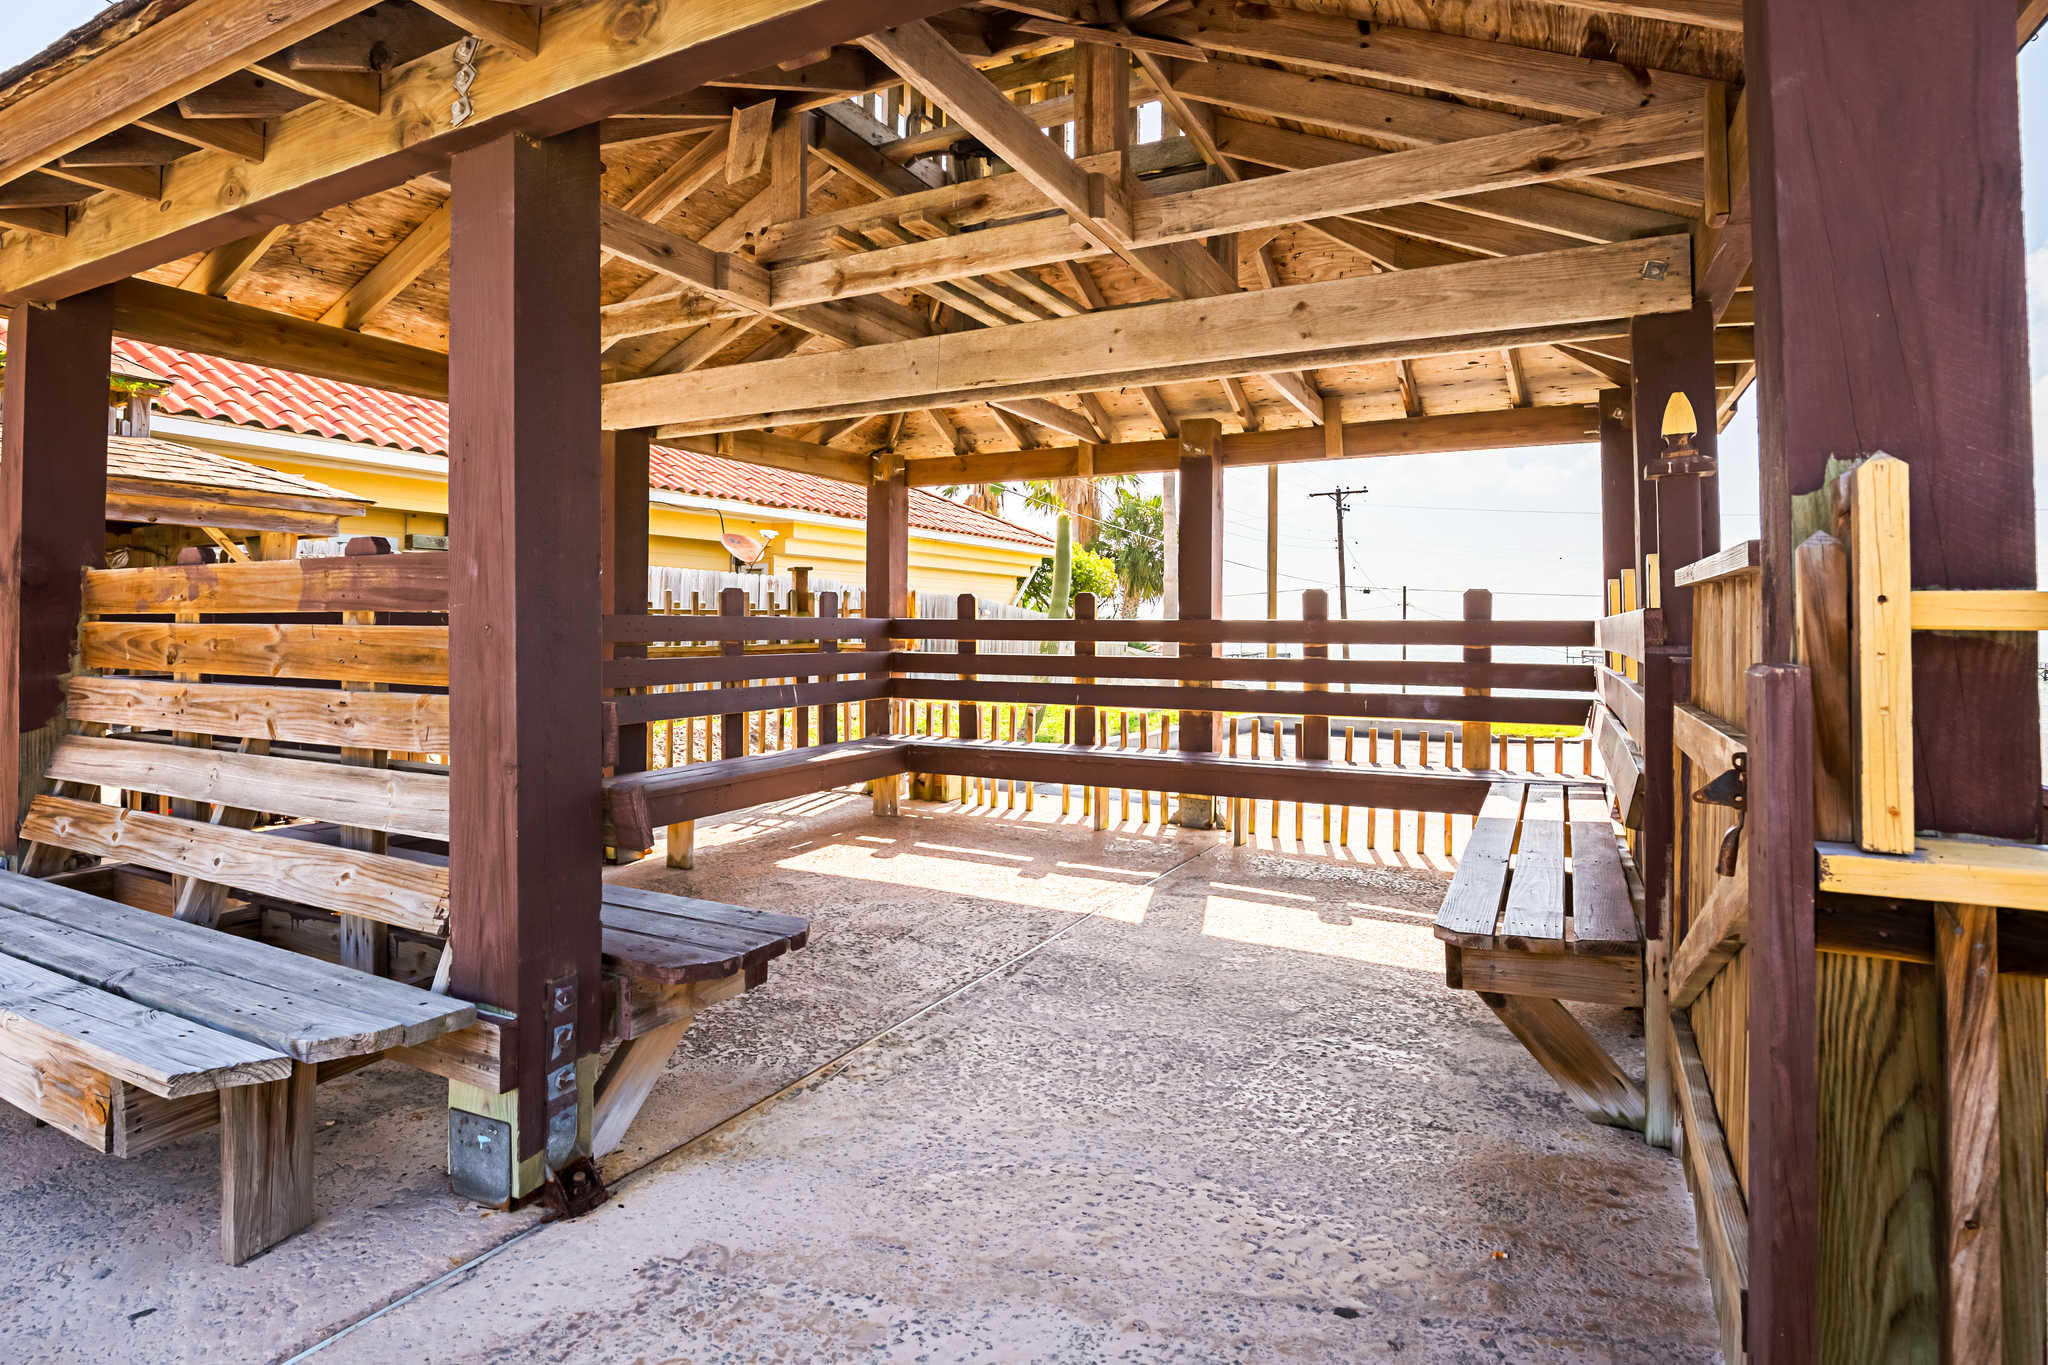 Quality Inn image 37